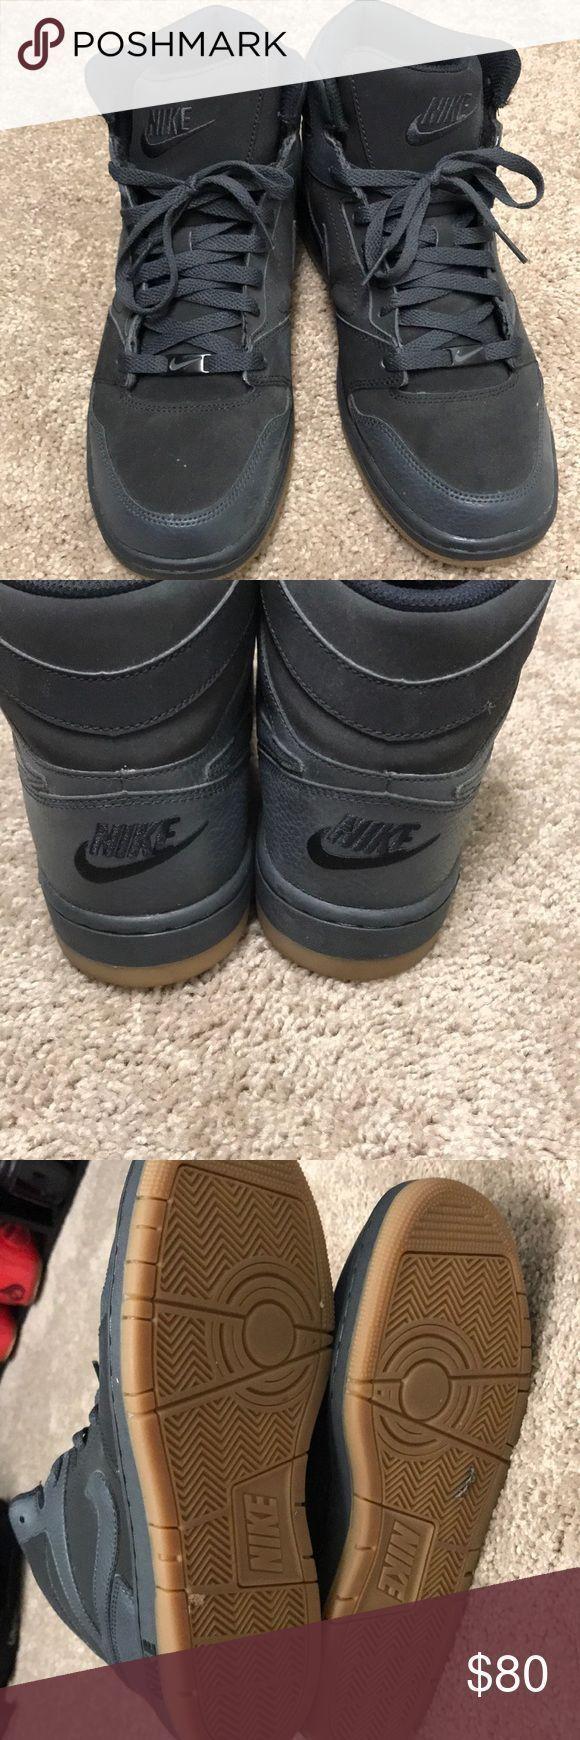 Herren Nike Sneakers Herren Nike Sneakers Größe 9,5. Ca. 3 mal getragen … – …